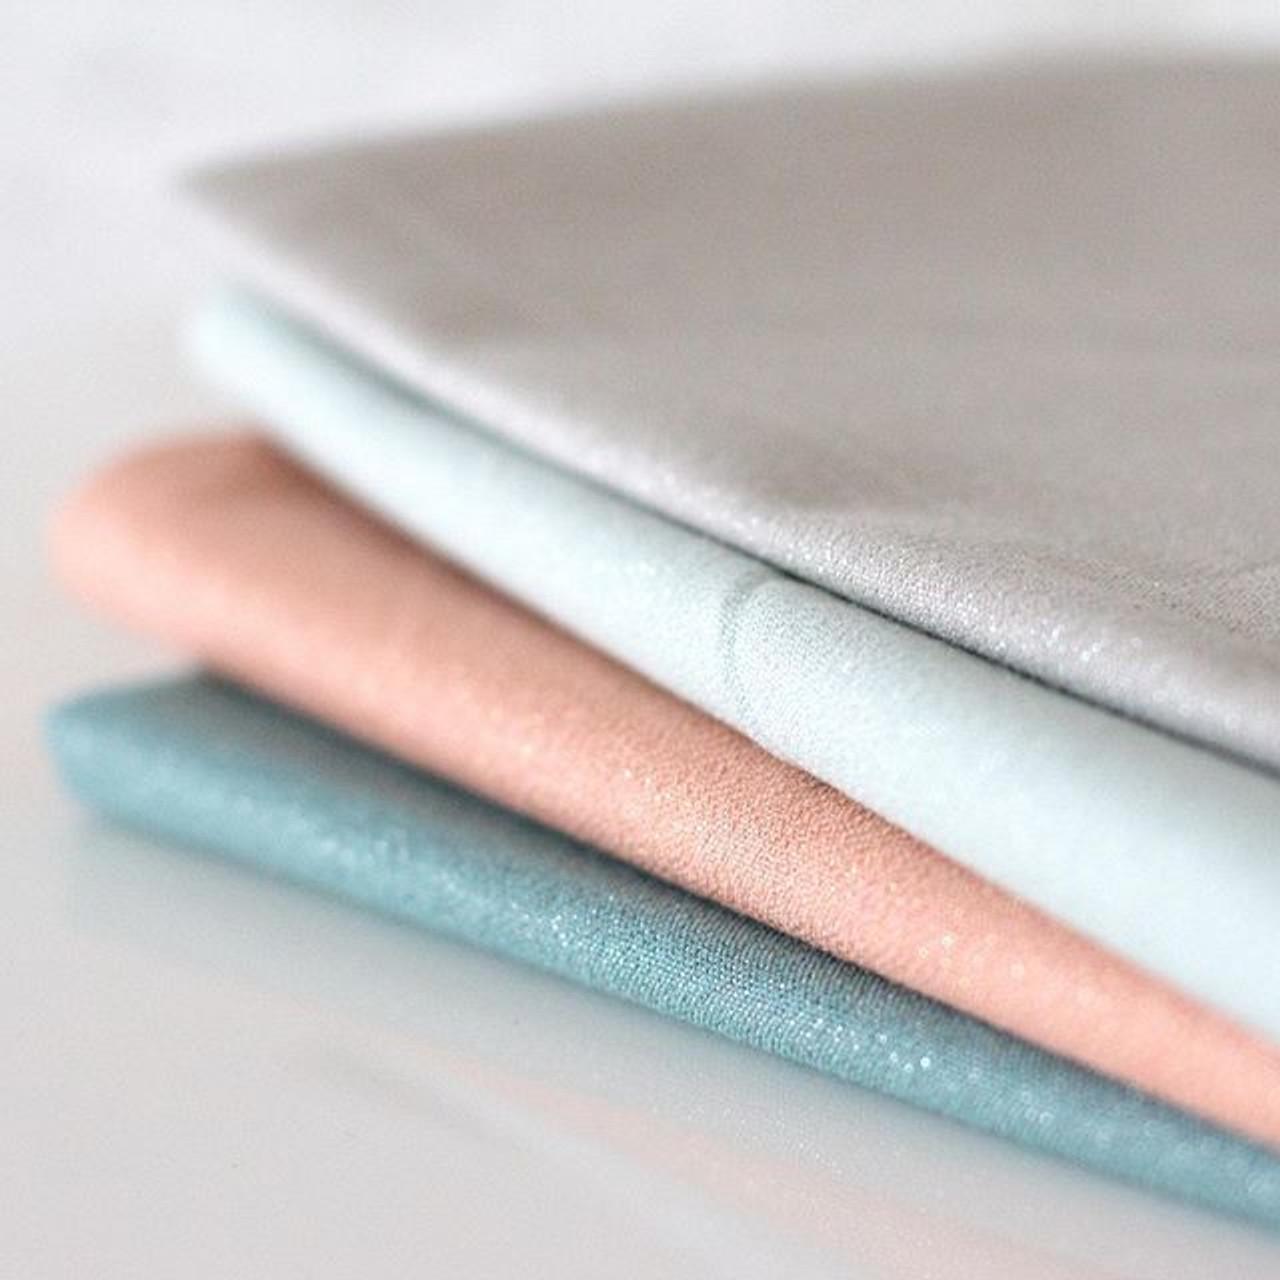 CLOUD 9, GLIMMER SOLIDS, 100% ORGANIC Cotton , Elegante Virgule Canada, Quilting Cotton